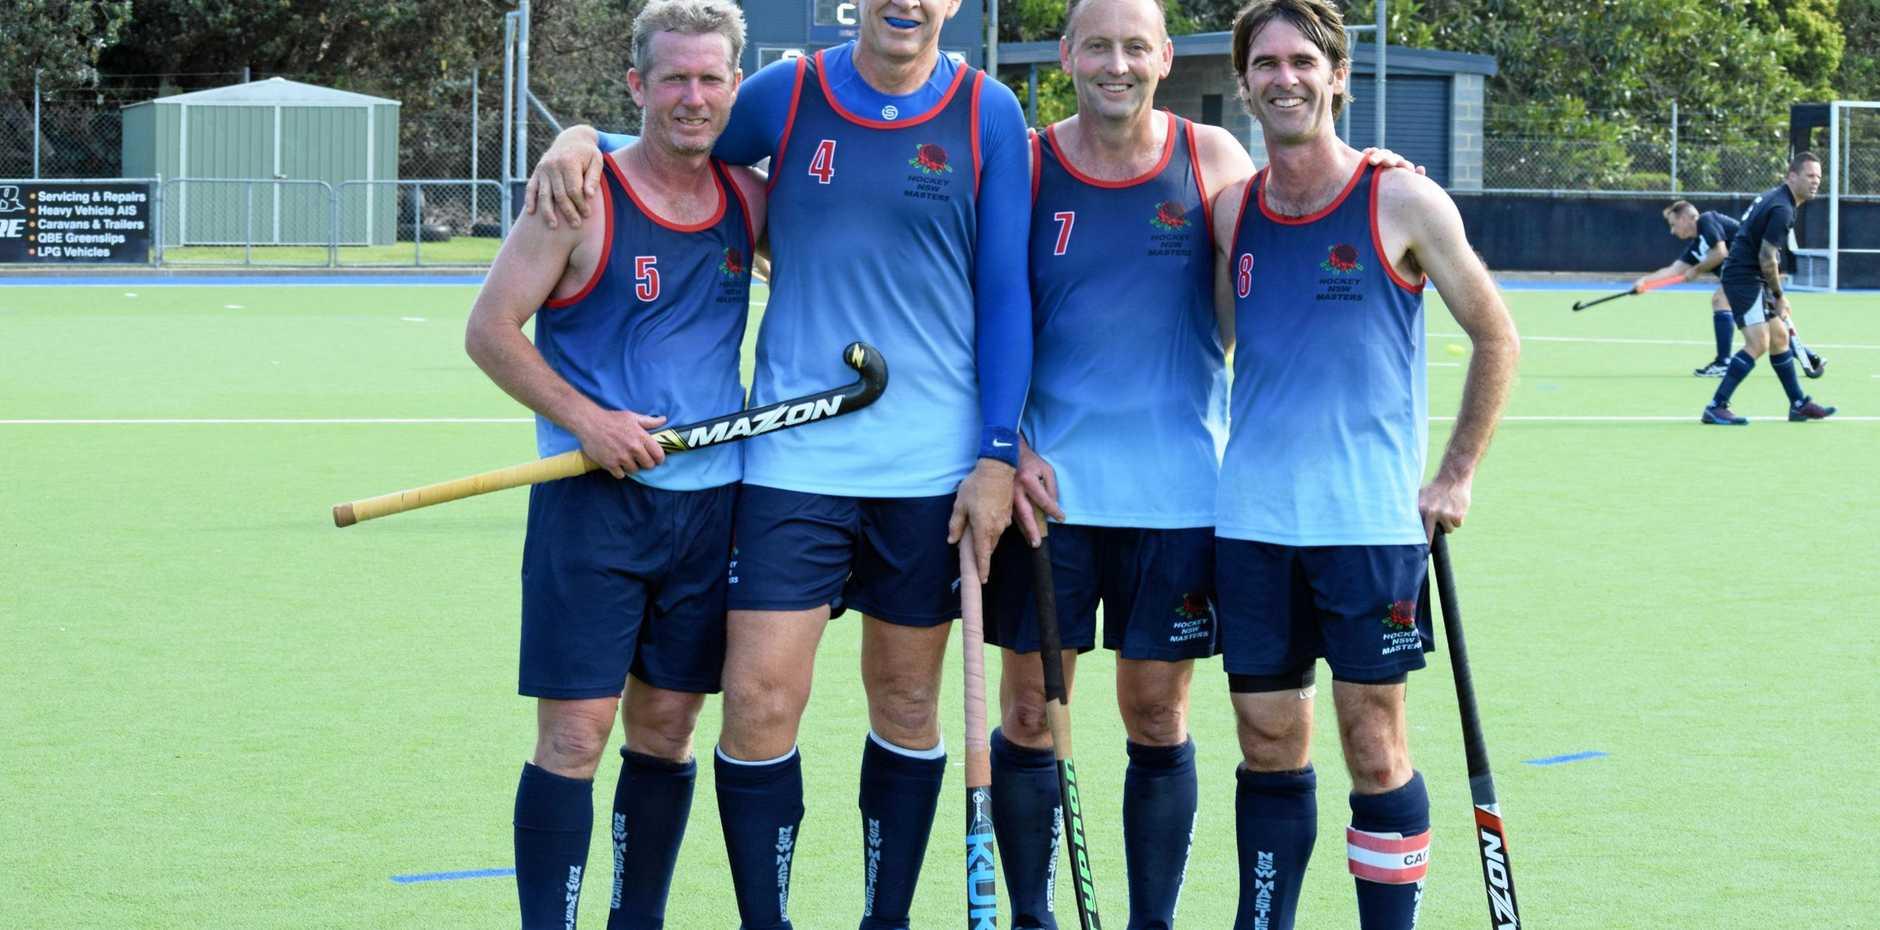 Far North Coast hockey players Mark Harris, Brett Crawford, Darryl Hughes and Grafton's Matt Lobsey are in the NSW over-40s team at the Australian hockey masters.